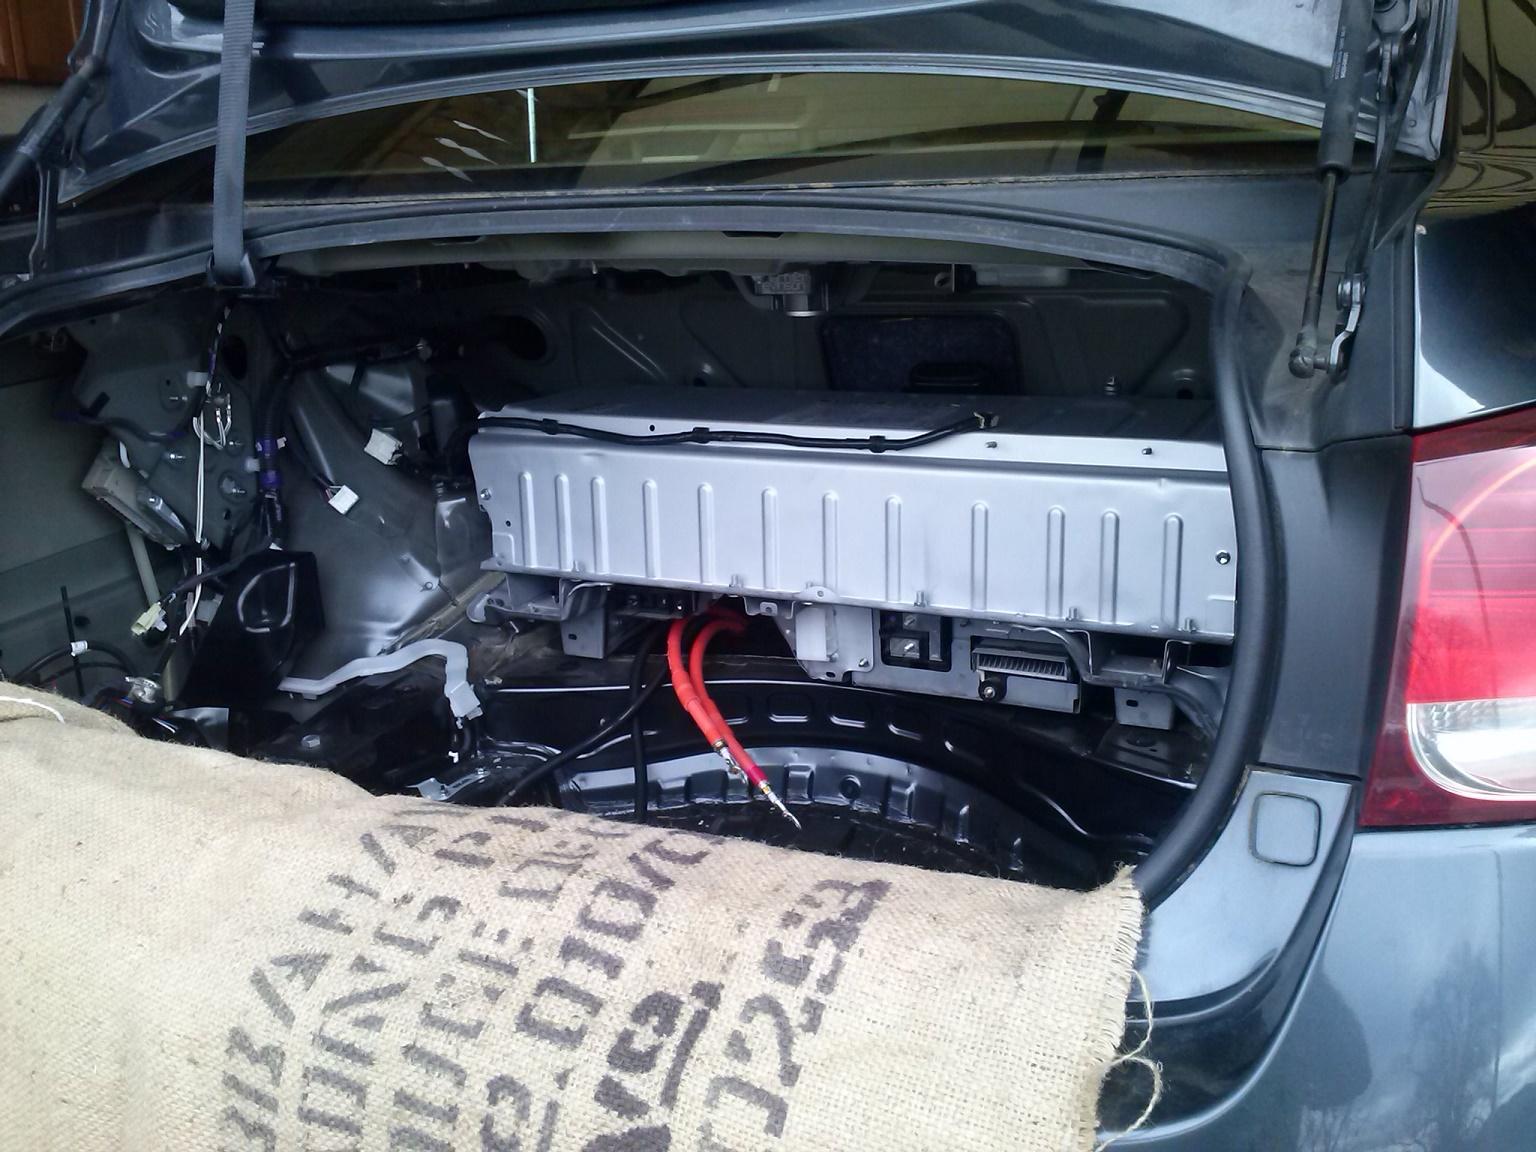 hybrid batterie reparatur priusforum. Black Bedroom Furniture Sets. Home Design Ideas